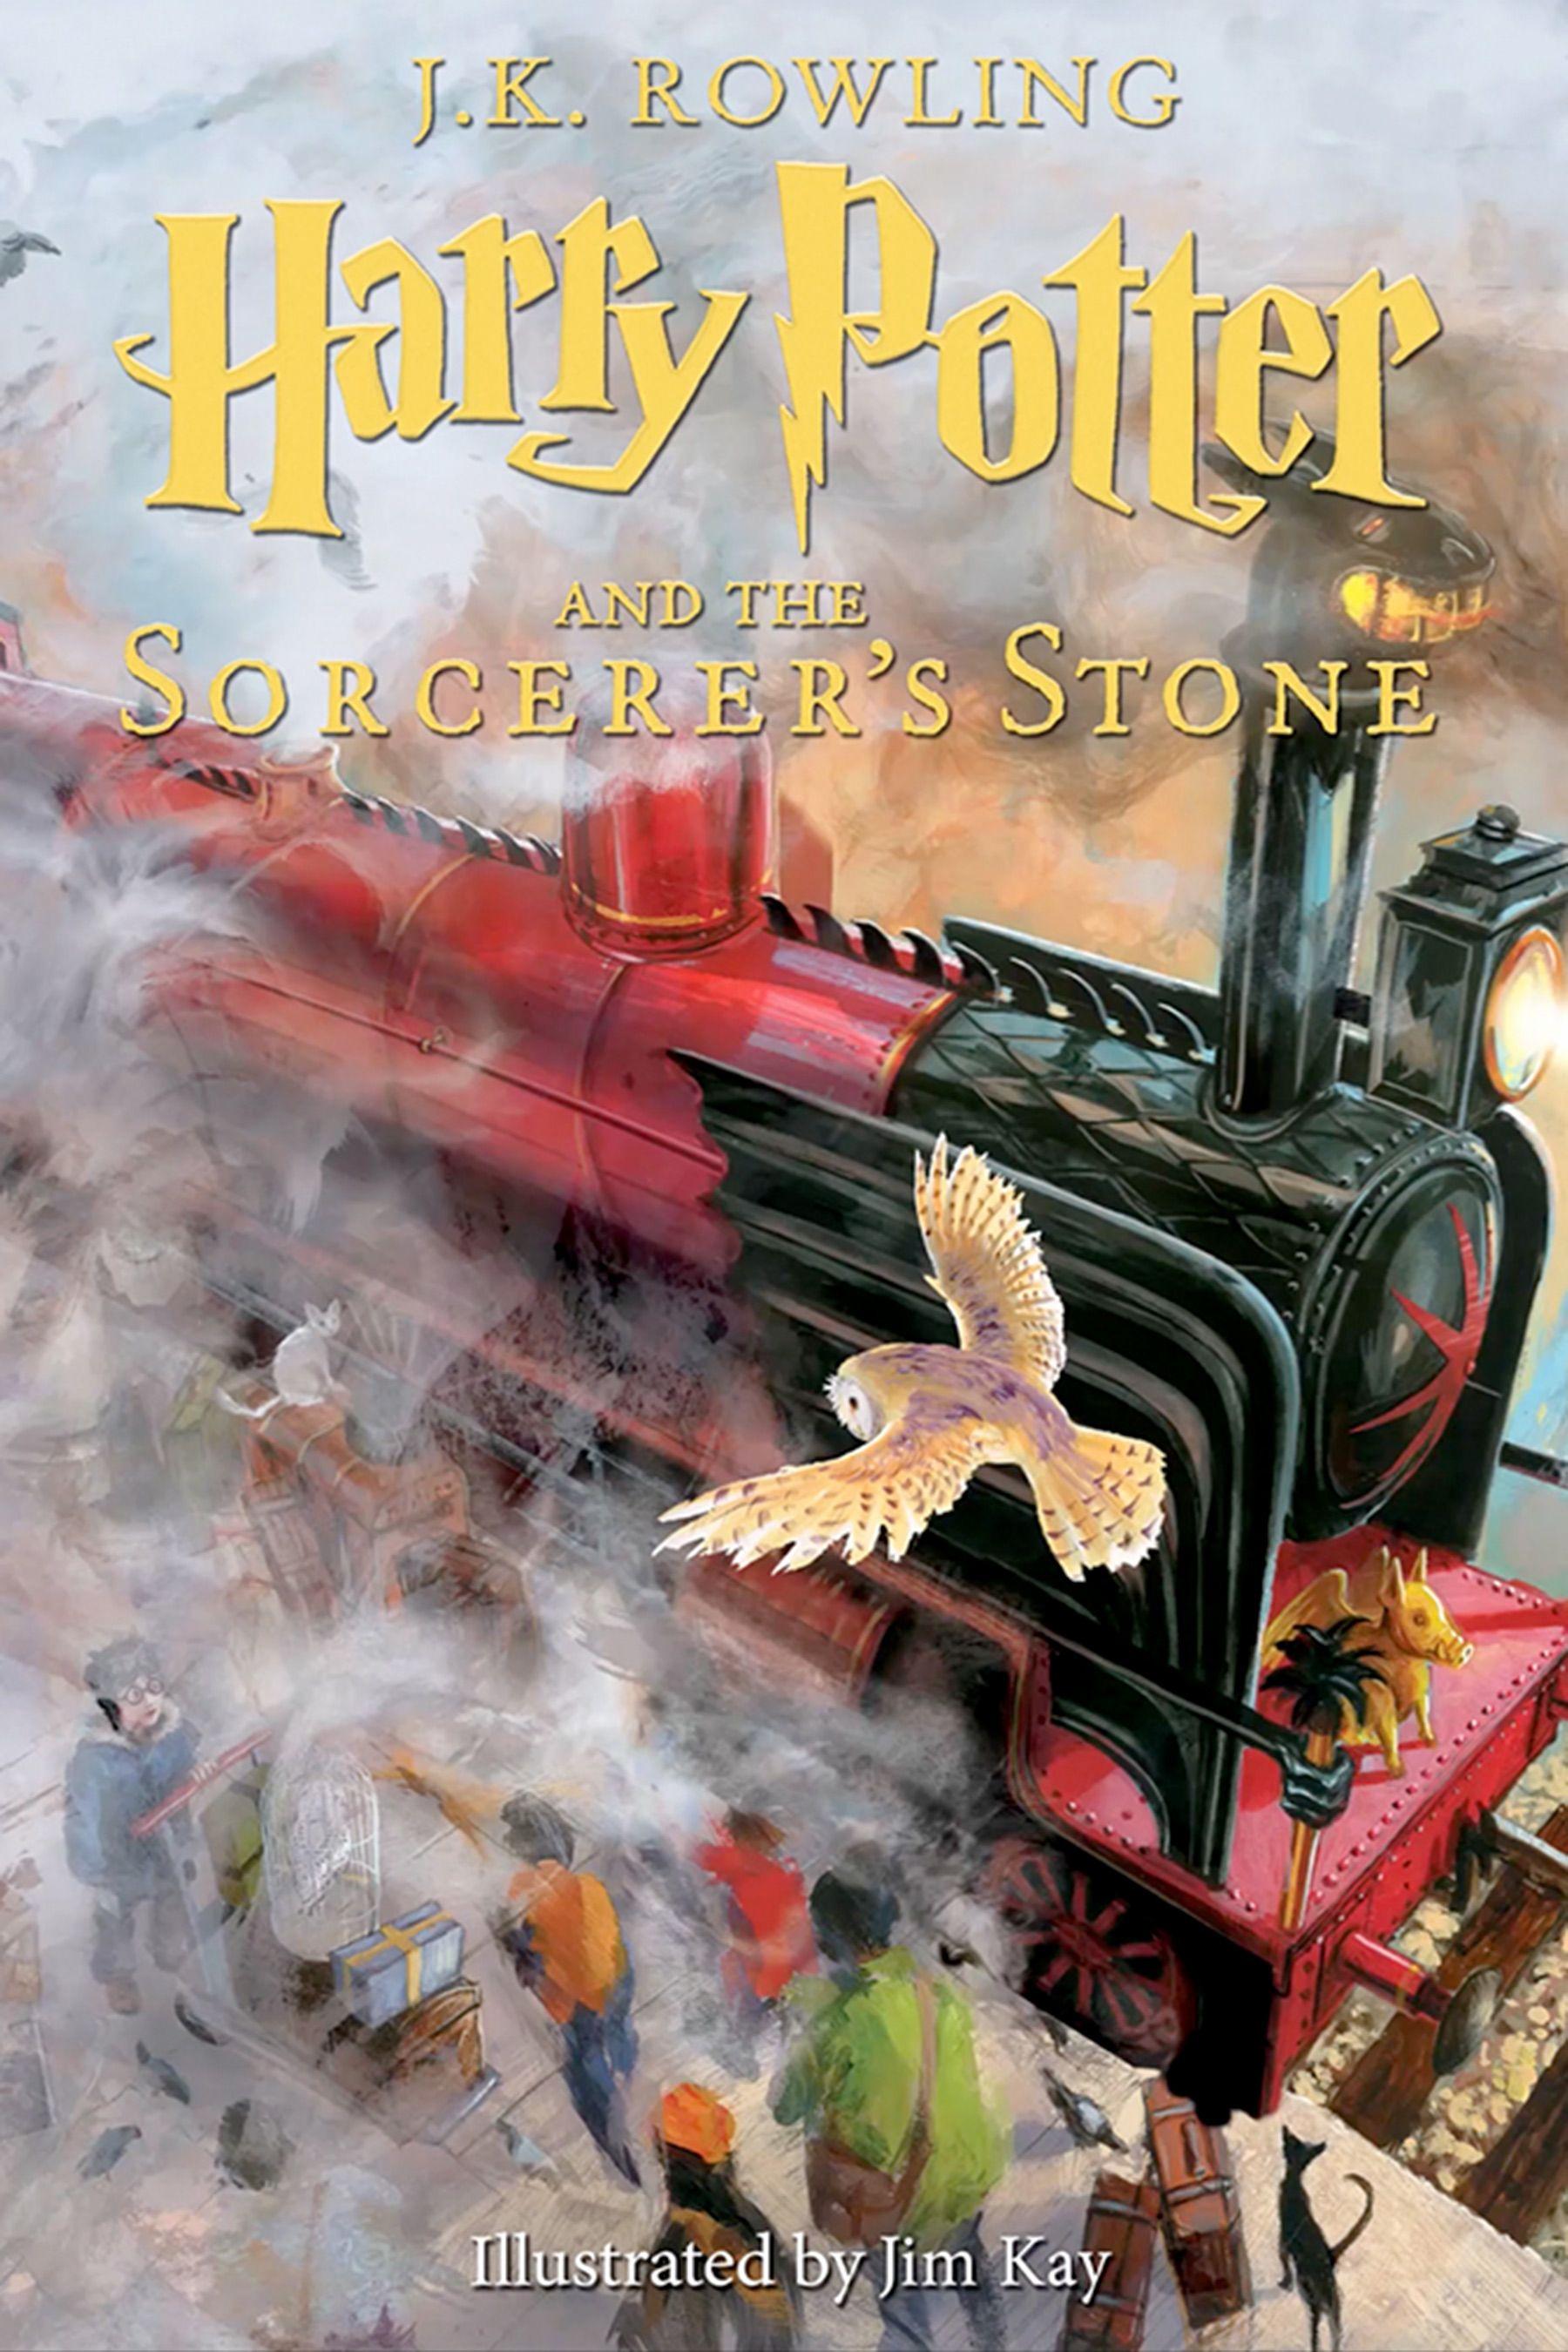 books like harry potter for adults reddit